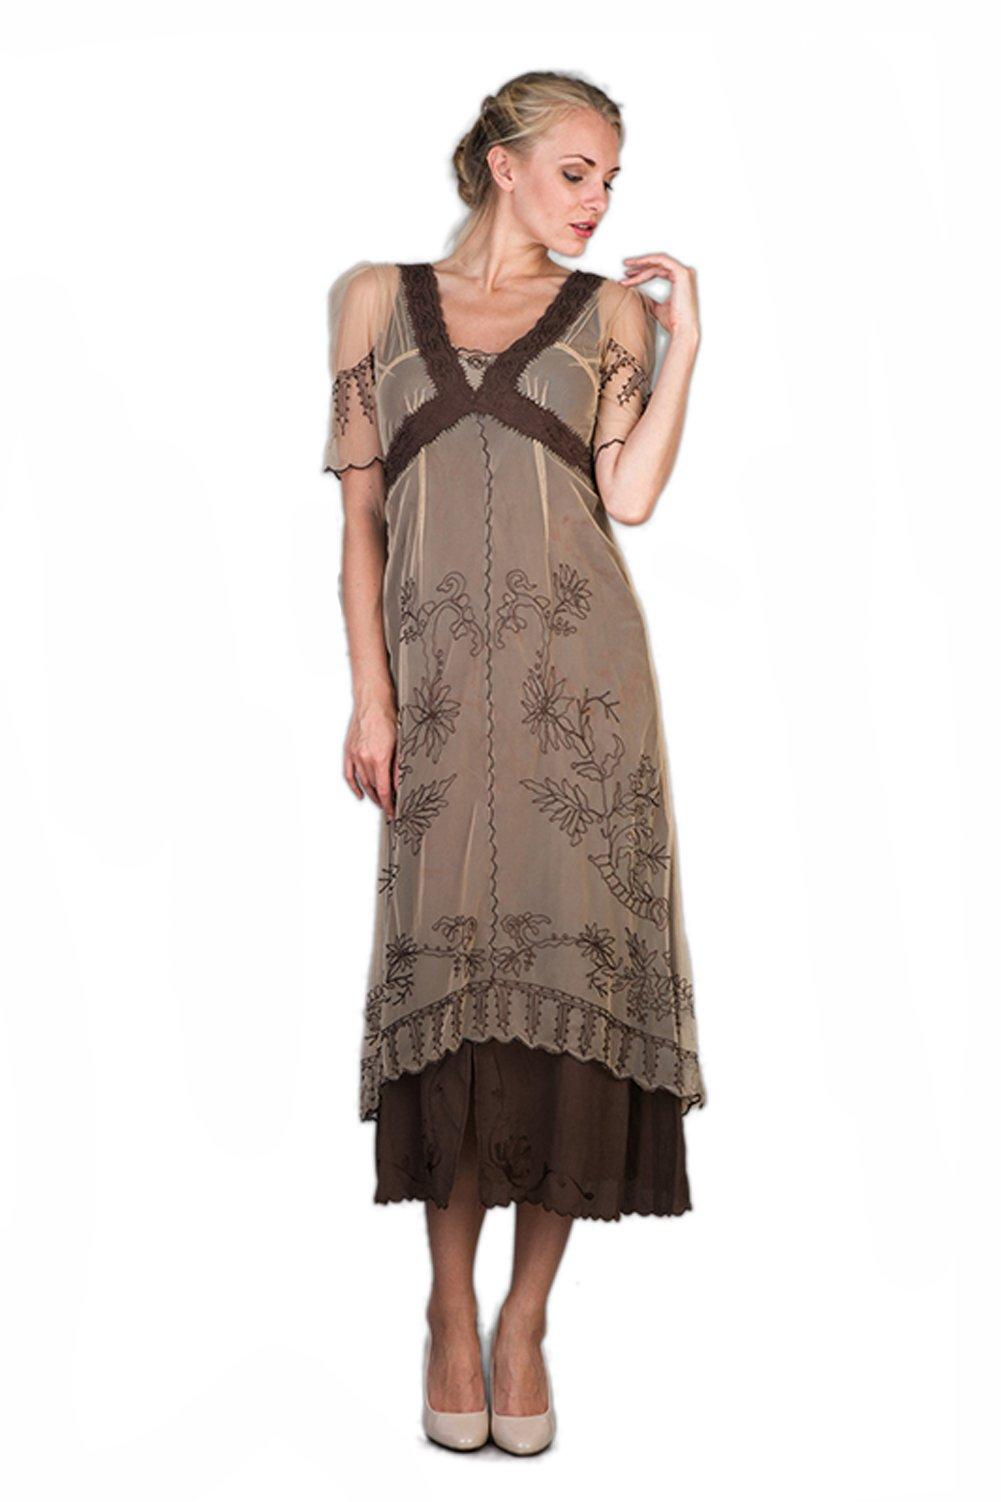 Nataya 40007 Women's Titanic Vintage Style Dress in Milk Coffee (X-Large) by Nataya